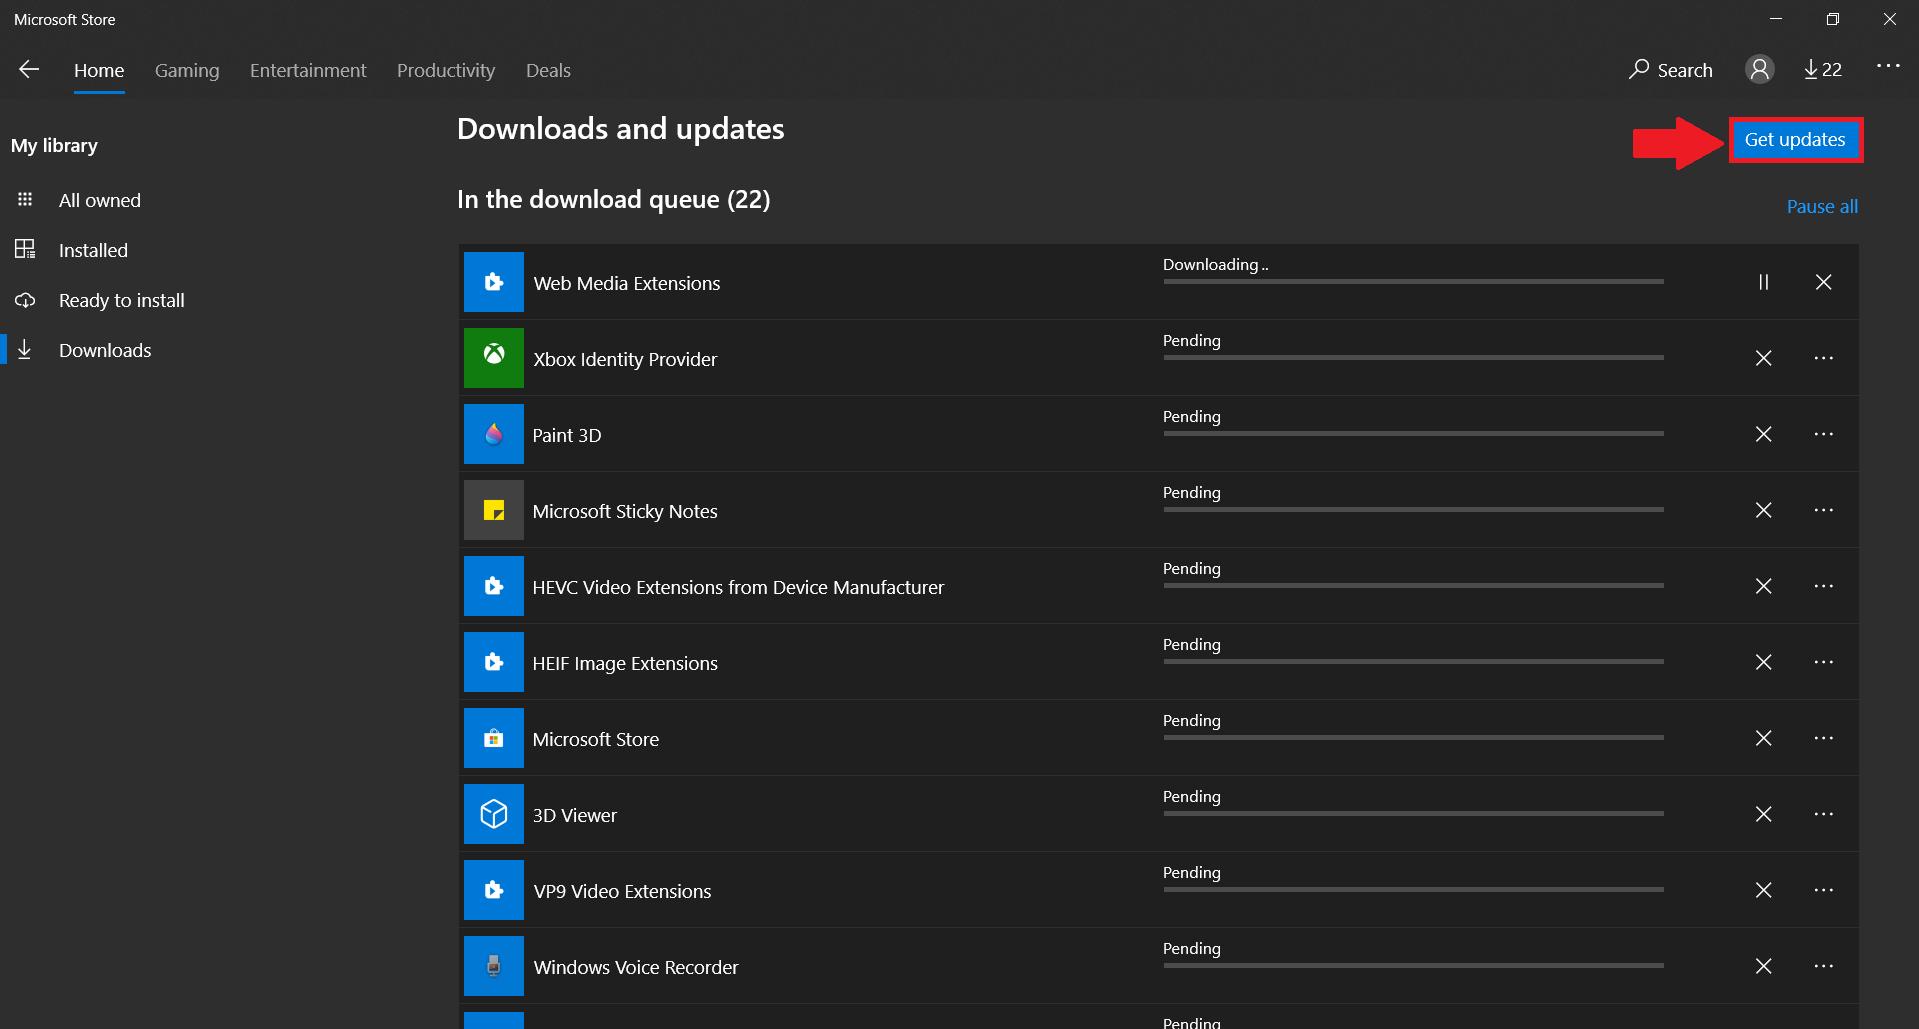 Updating on Microsoft Store